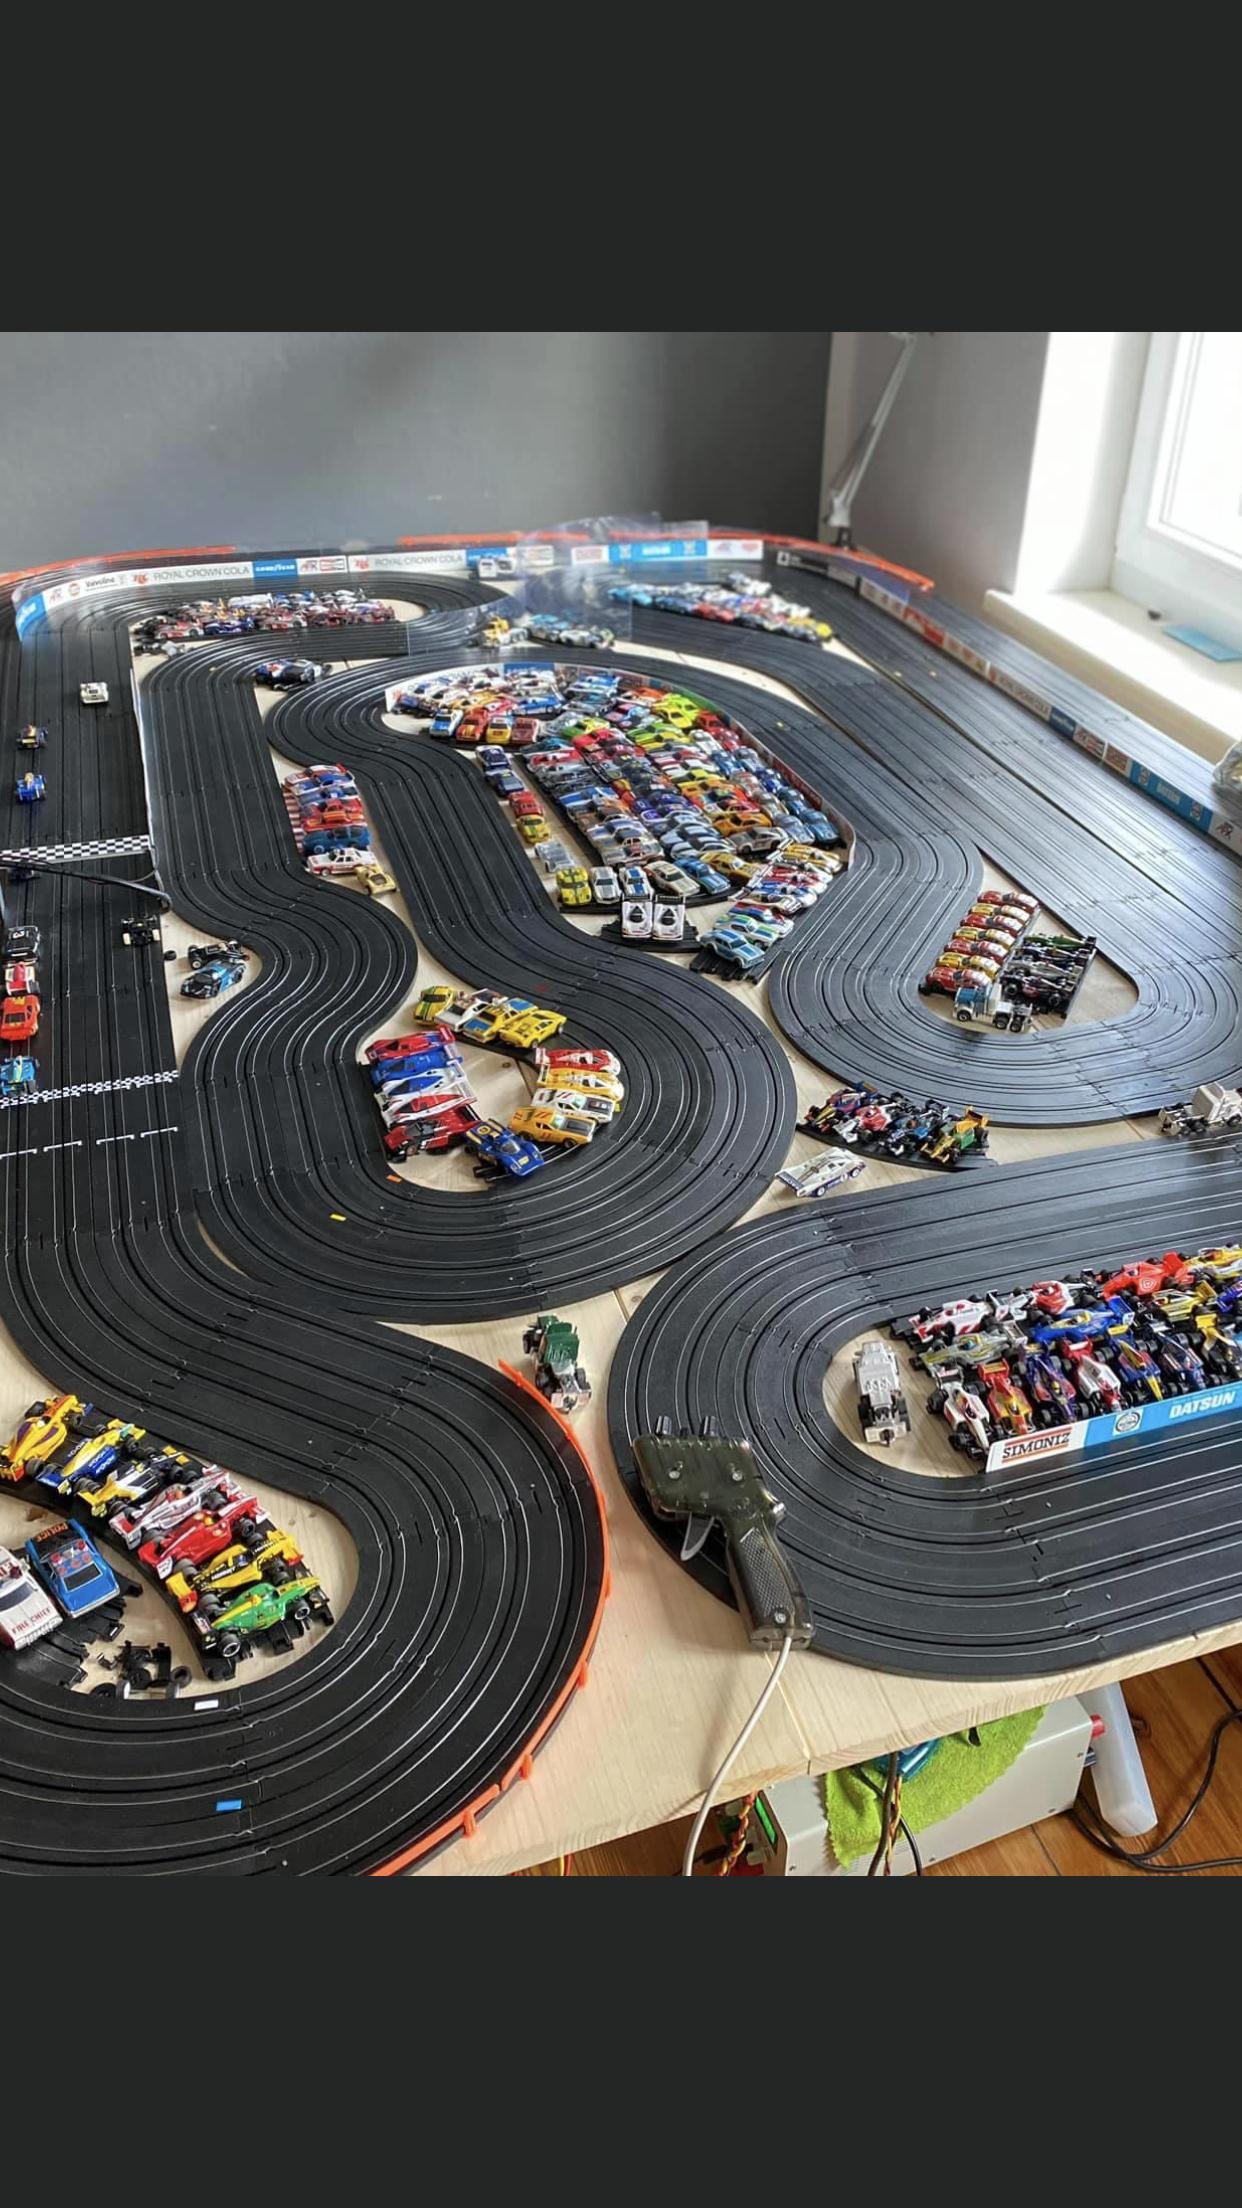 1 64 Ho Slot Car Tracks Slot Cars Slot Car Tracks Afx Slot Cars